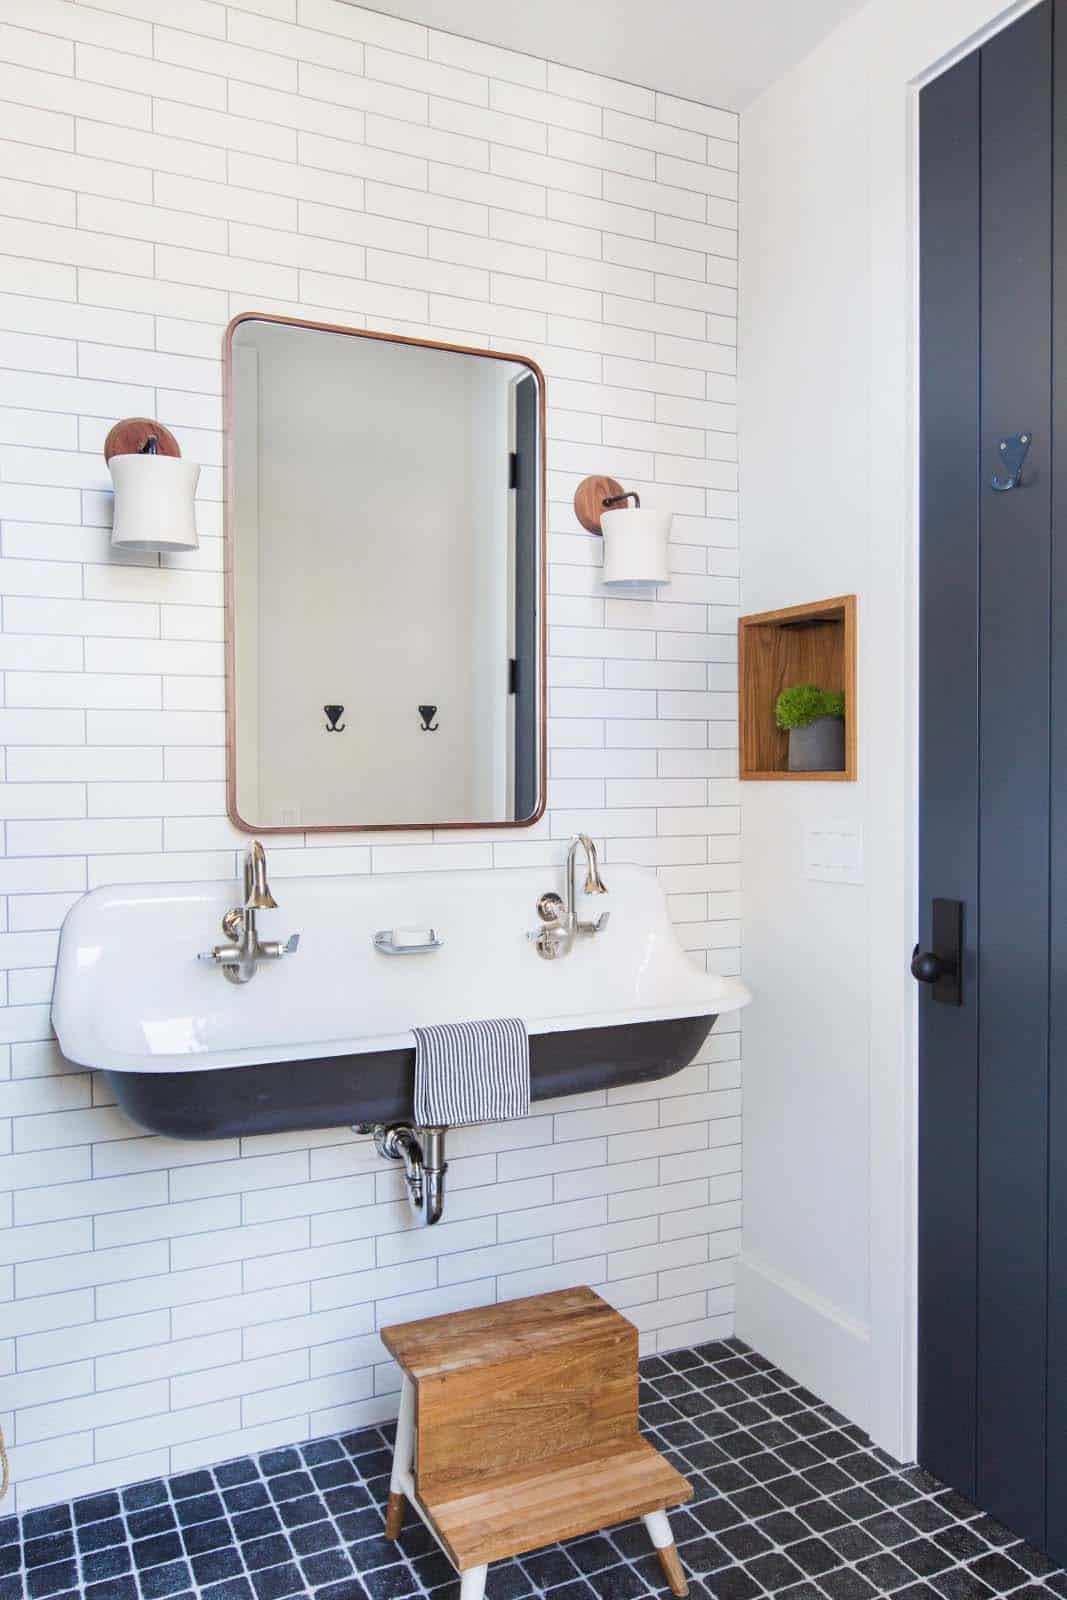 salle de bain de style côtier